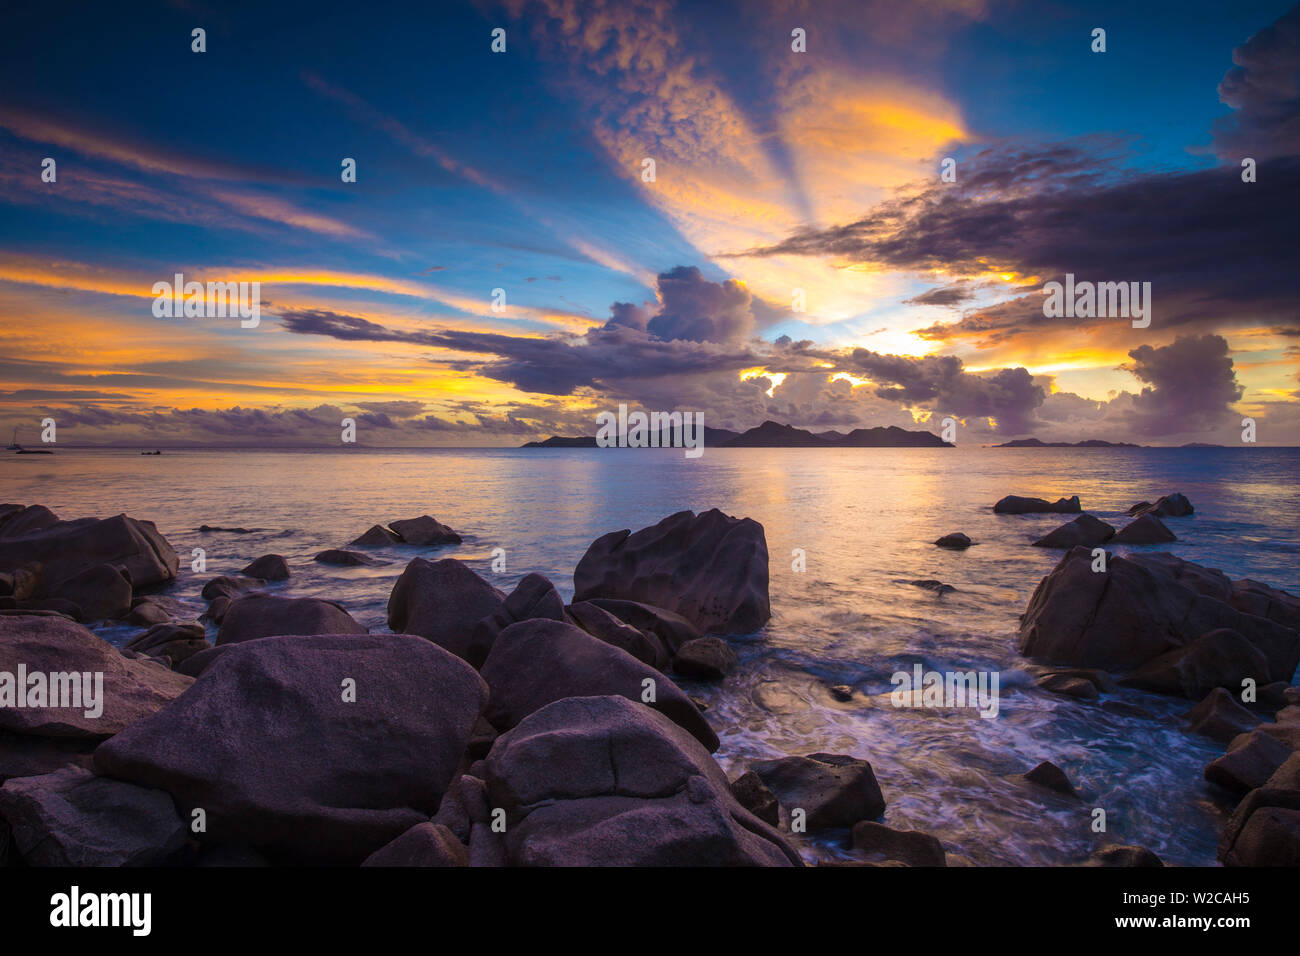 Beach at sunset, La Digue, Seychelles - Stock Image